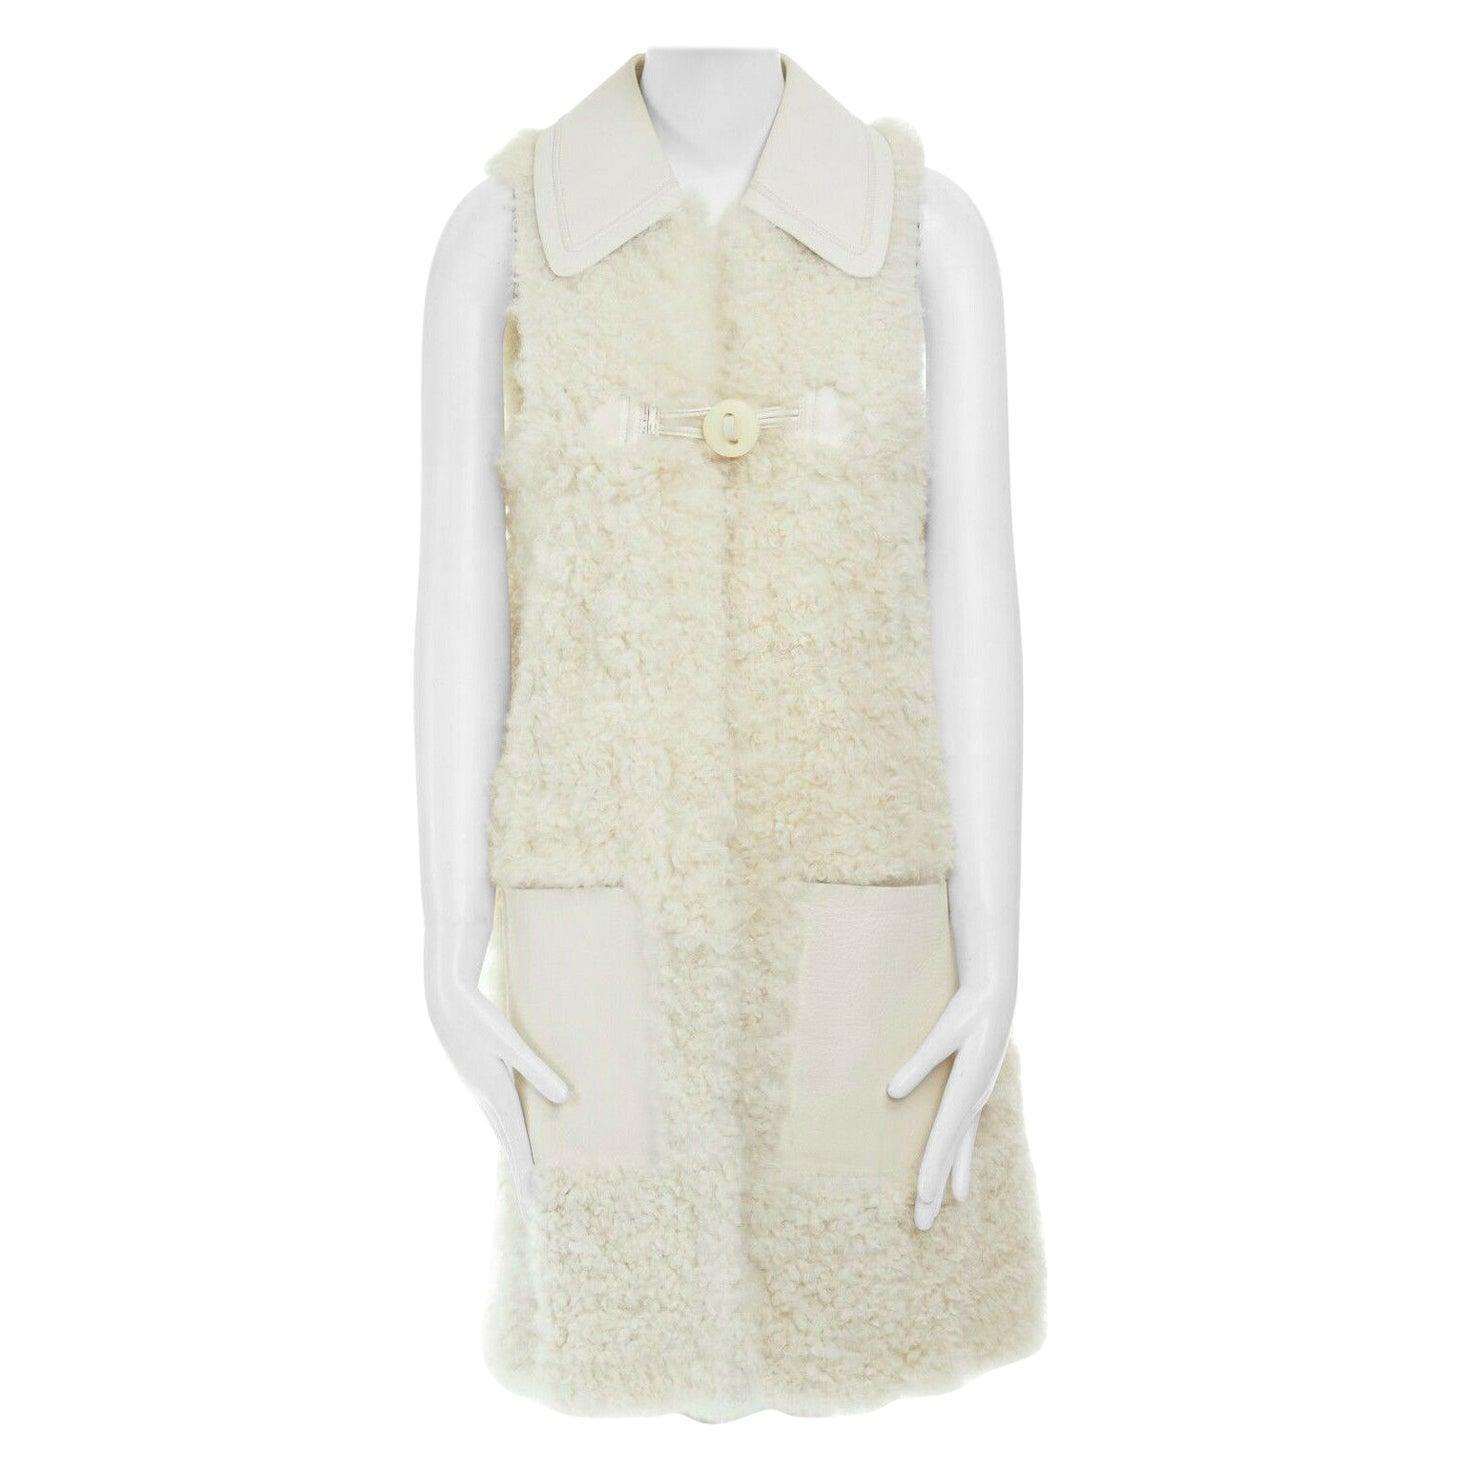 runway FENDI shearling fur white leather collar patch pocket vest jacket IT40 S